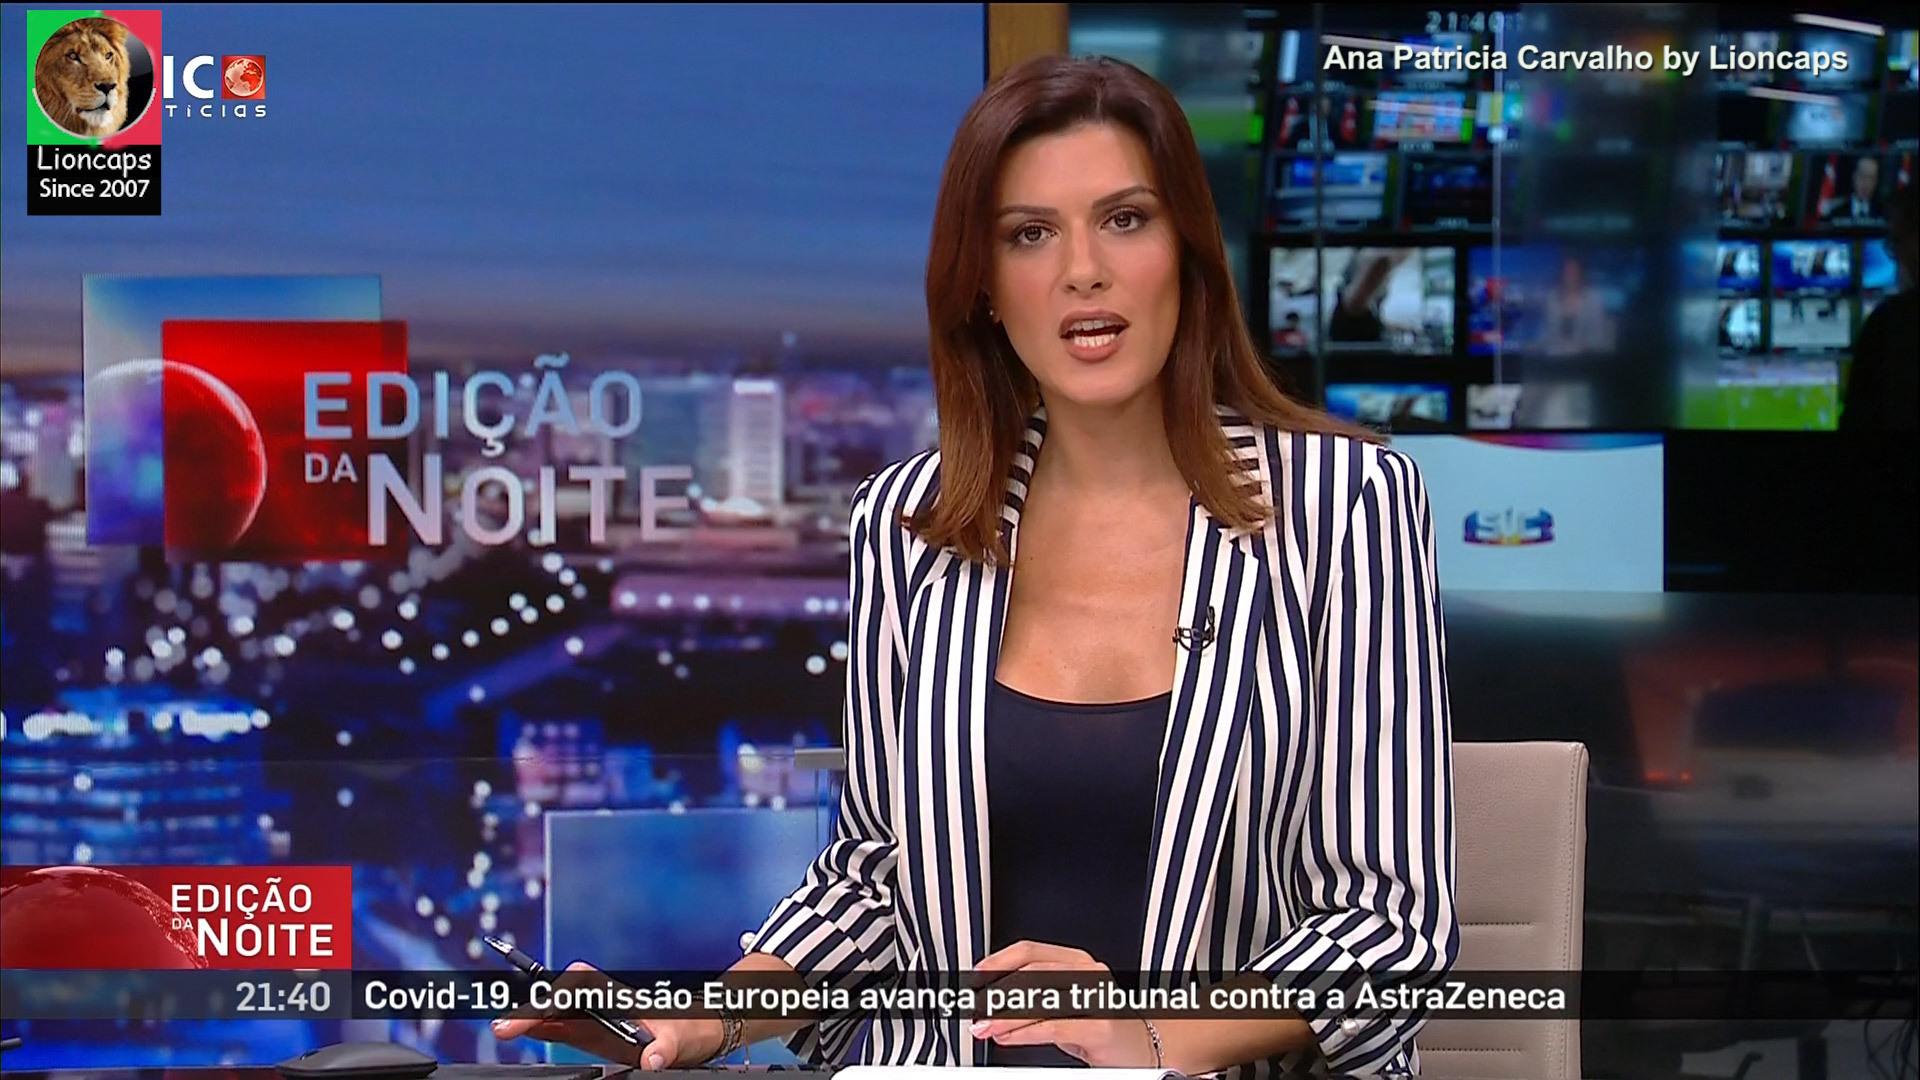 ana_patricia_carvalho_sicn_lioncaps_30_05_2021 (9).jpg